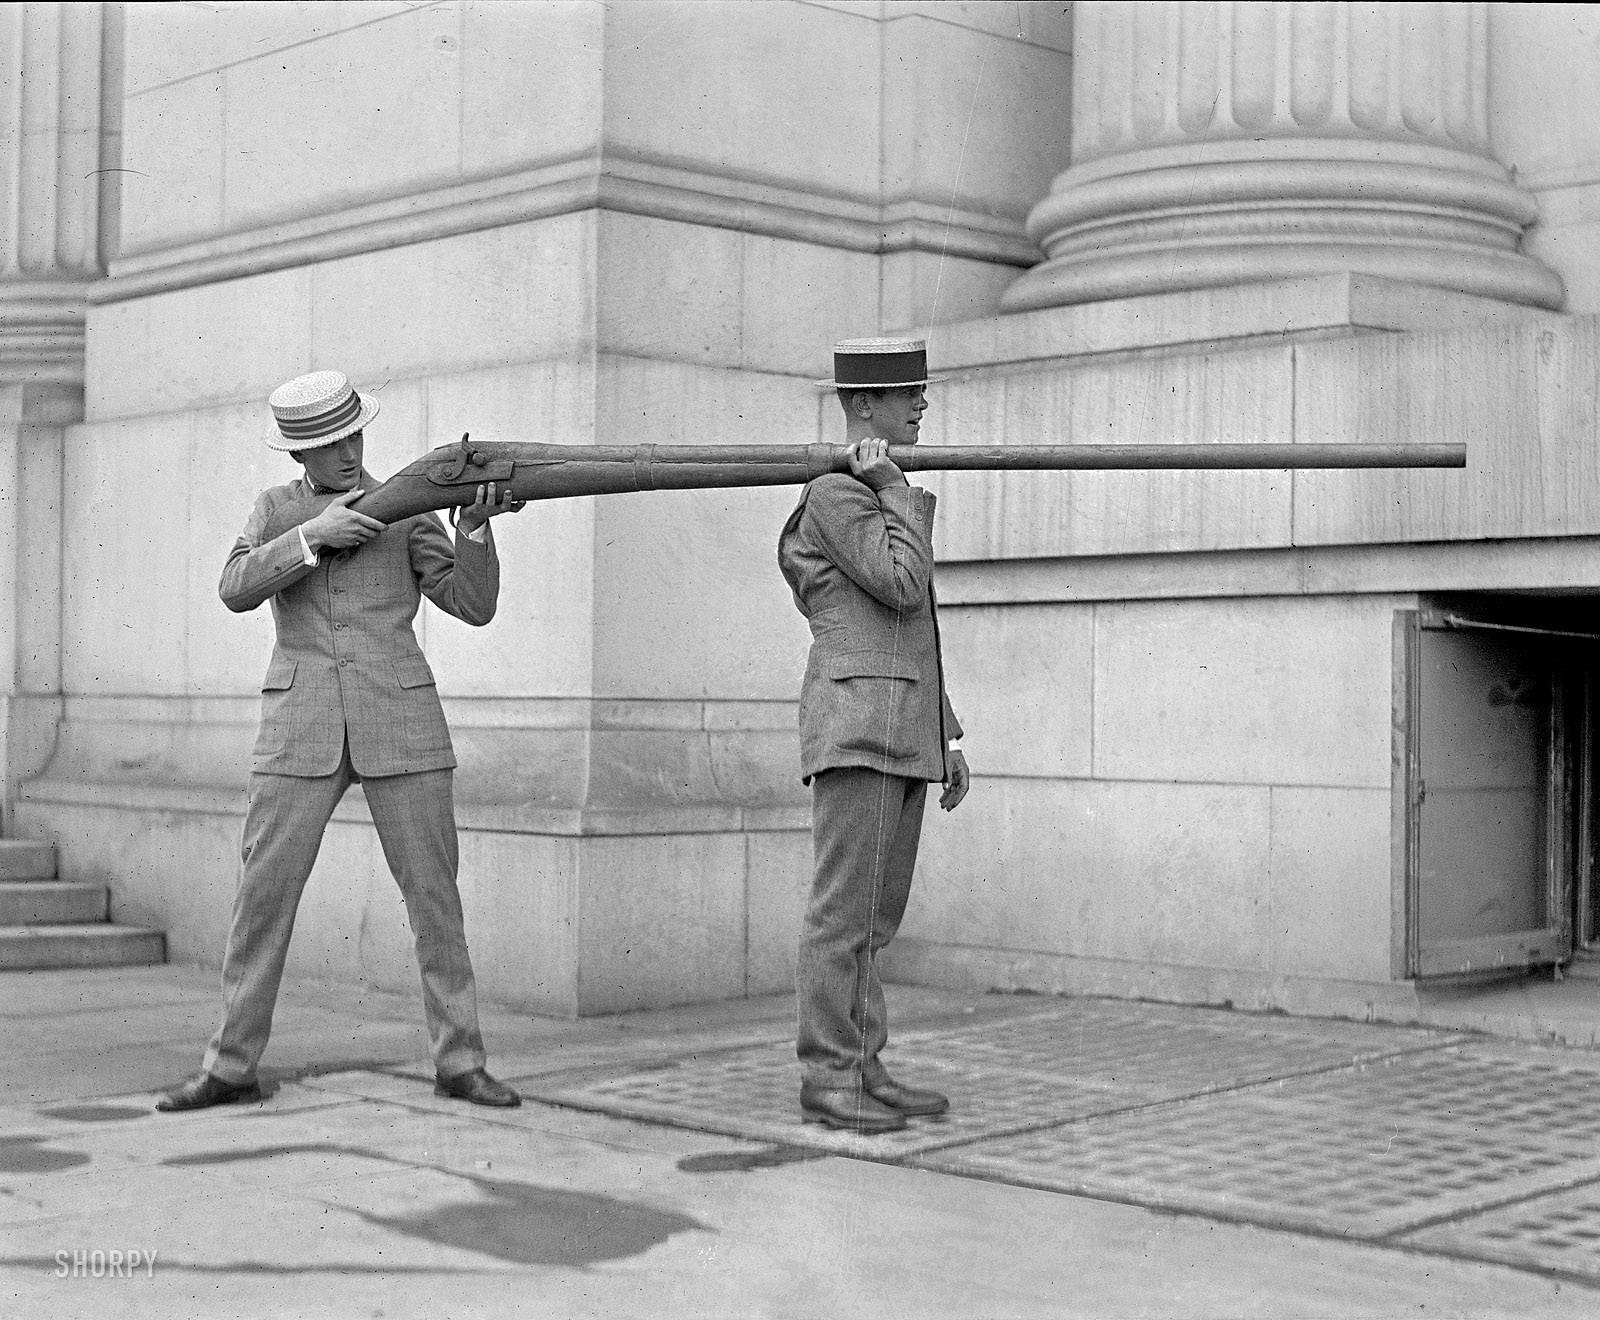 punt-gun-1.jpg